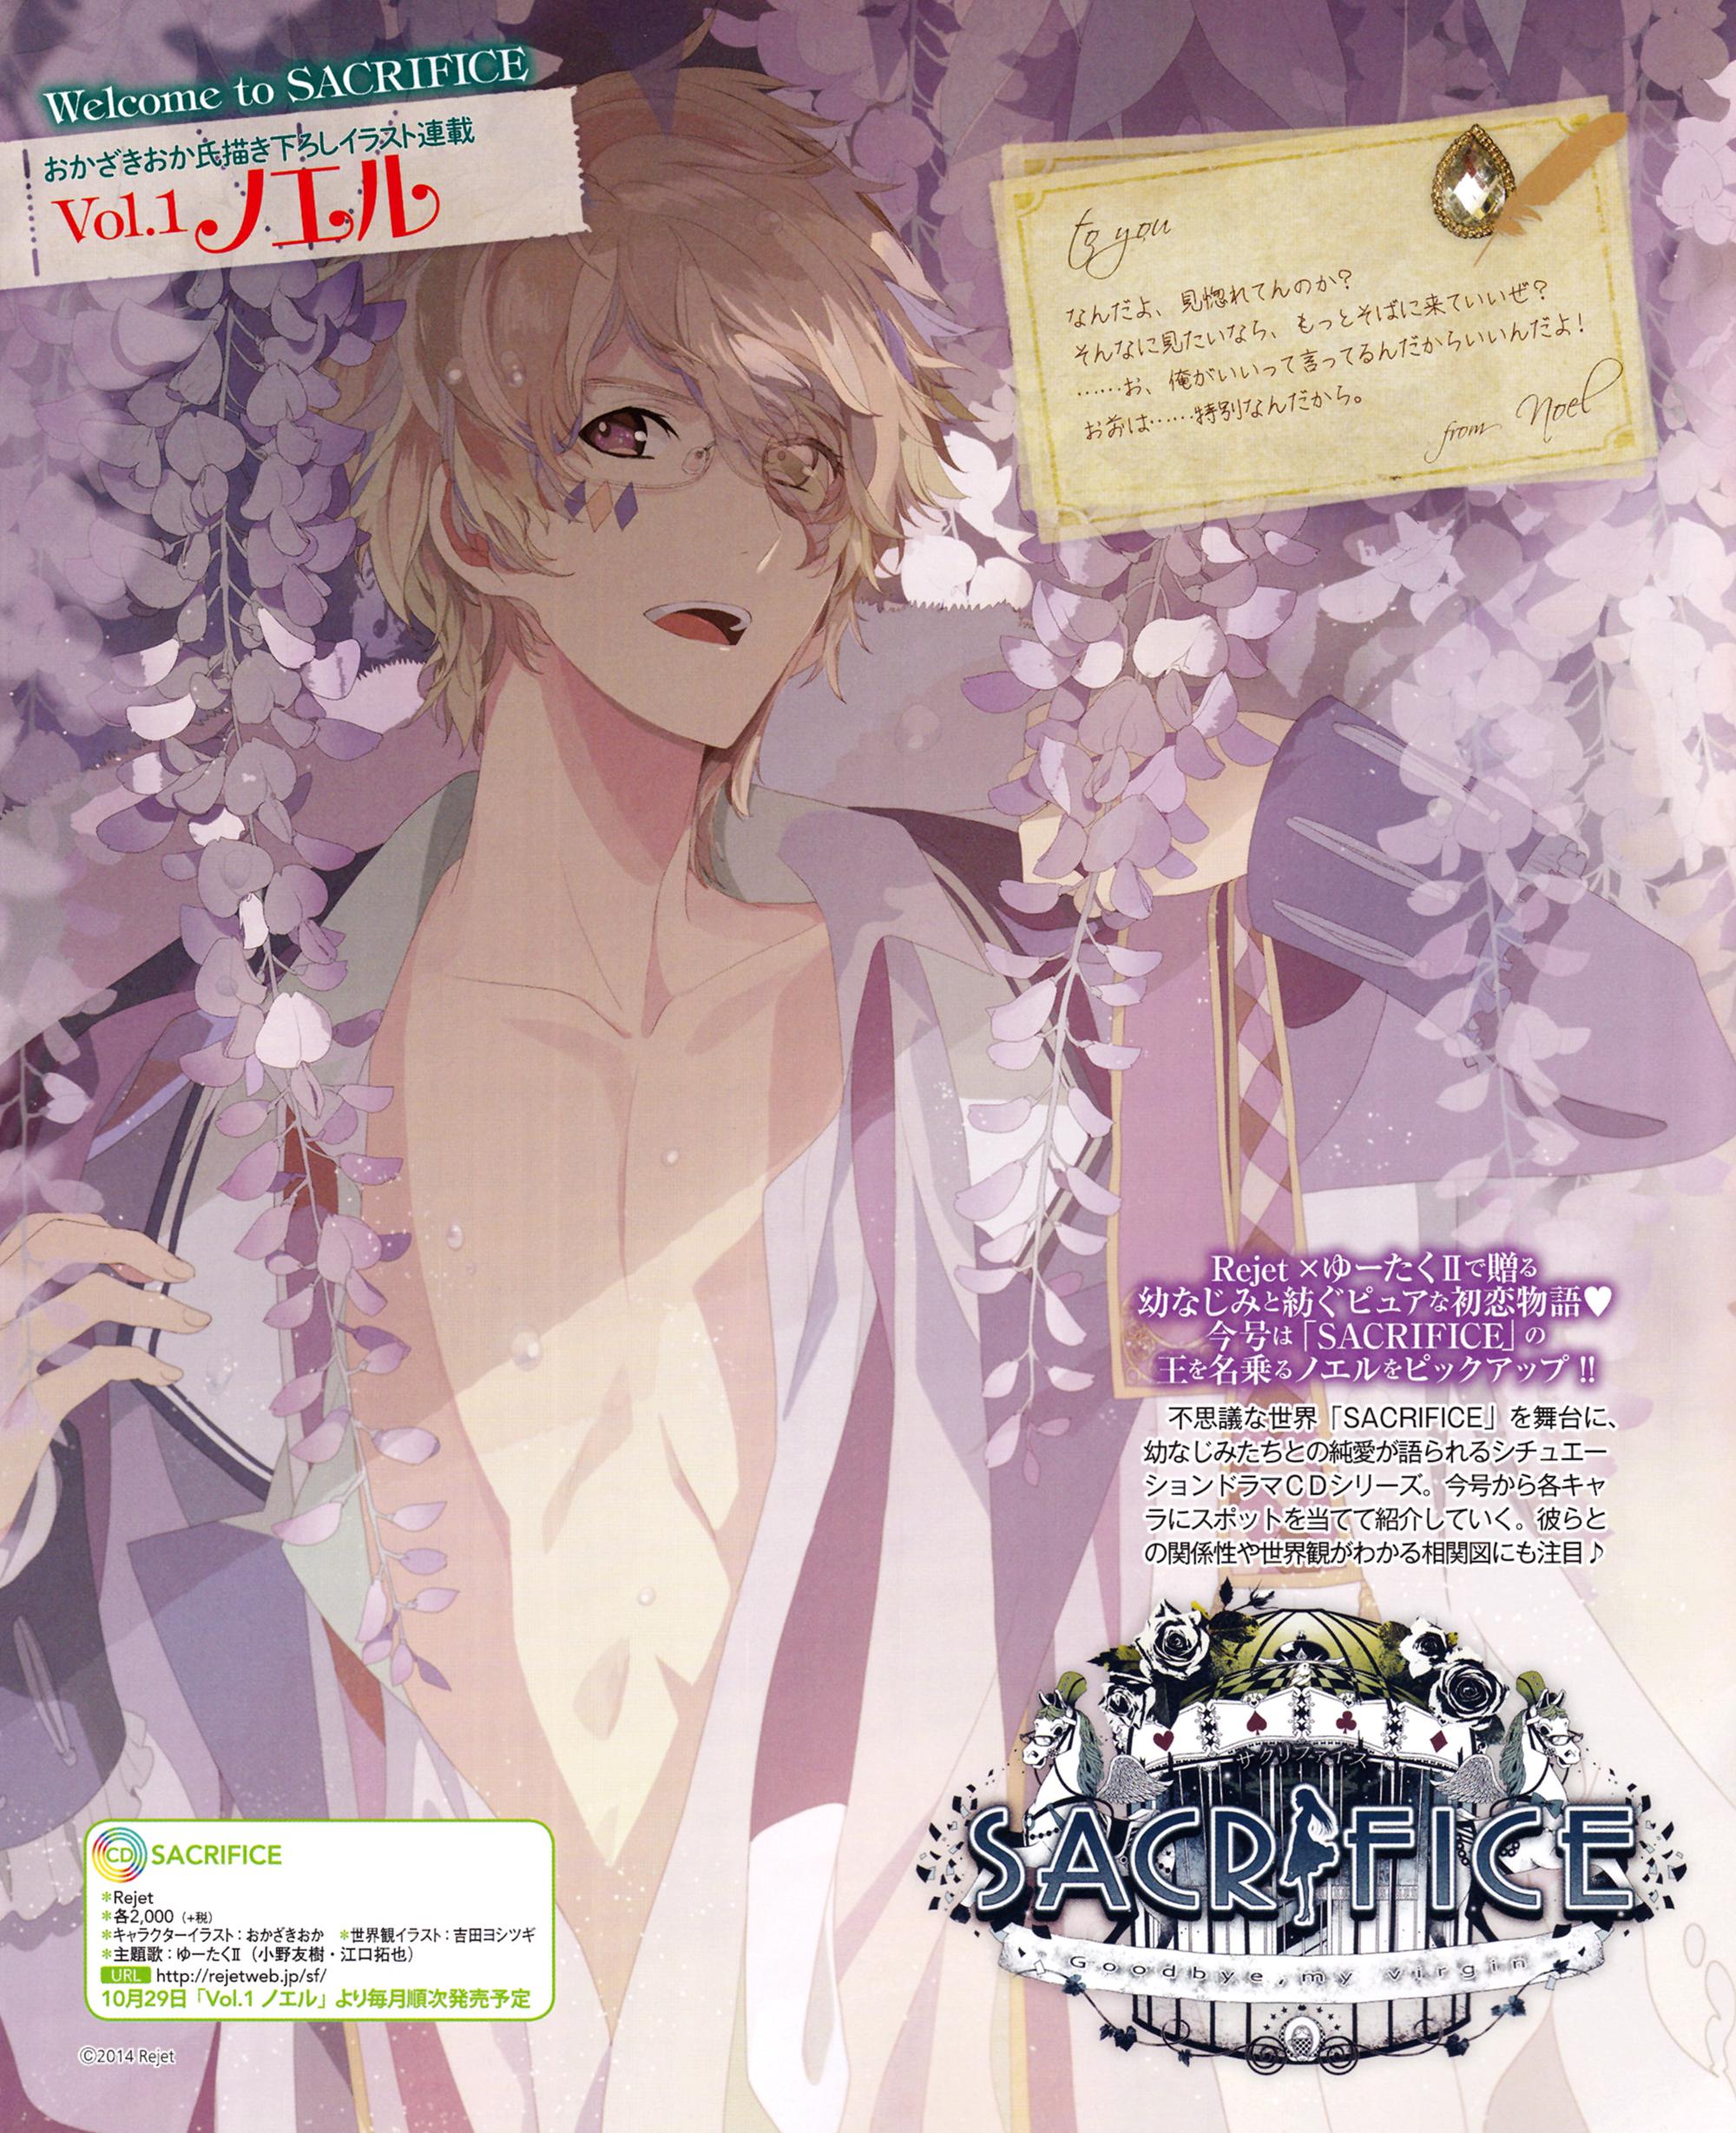 Serikawa Noel - SACRIFICE (Drama CD) - Image #1773284 - Zerochan